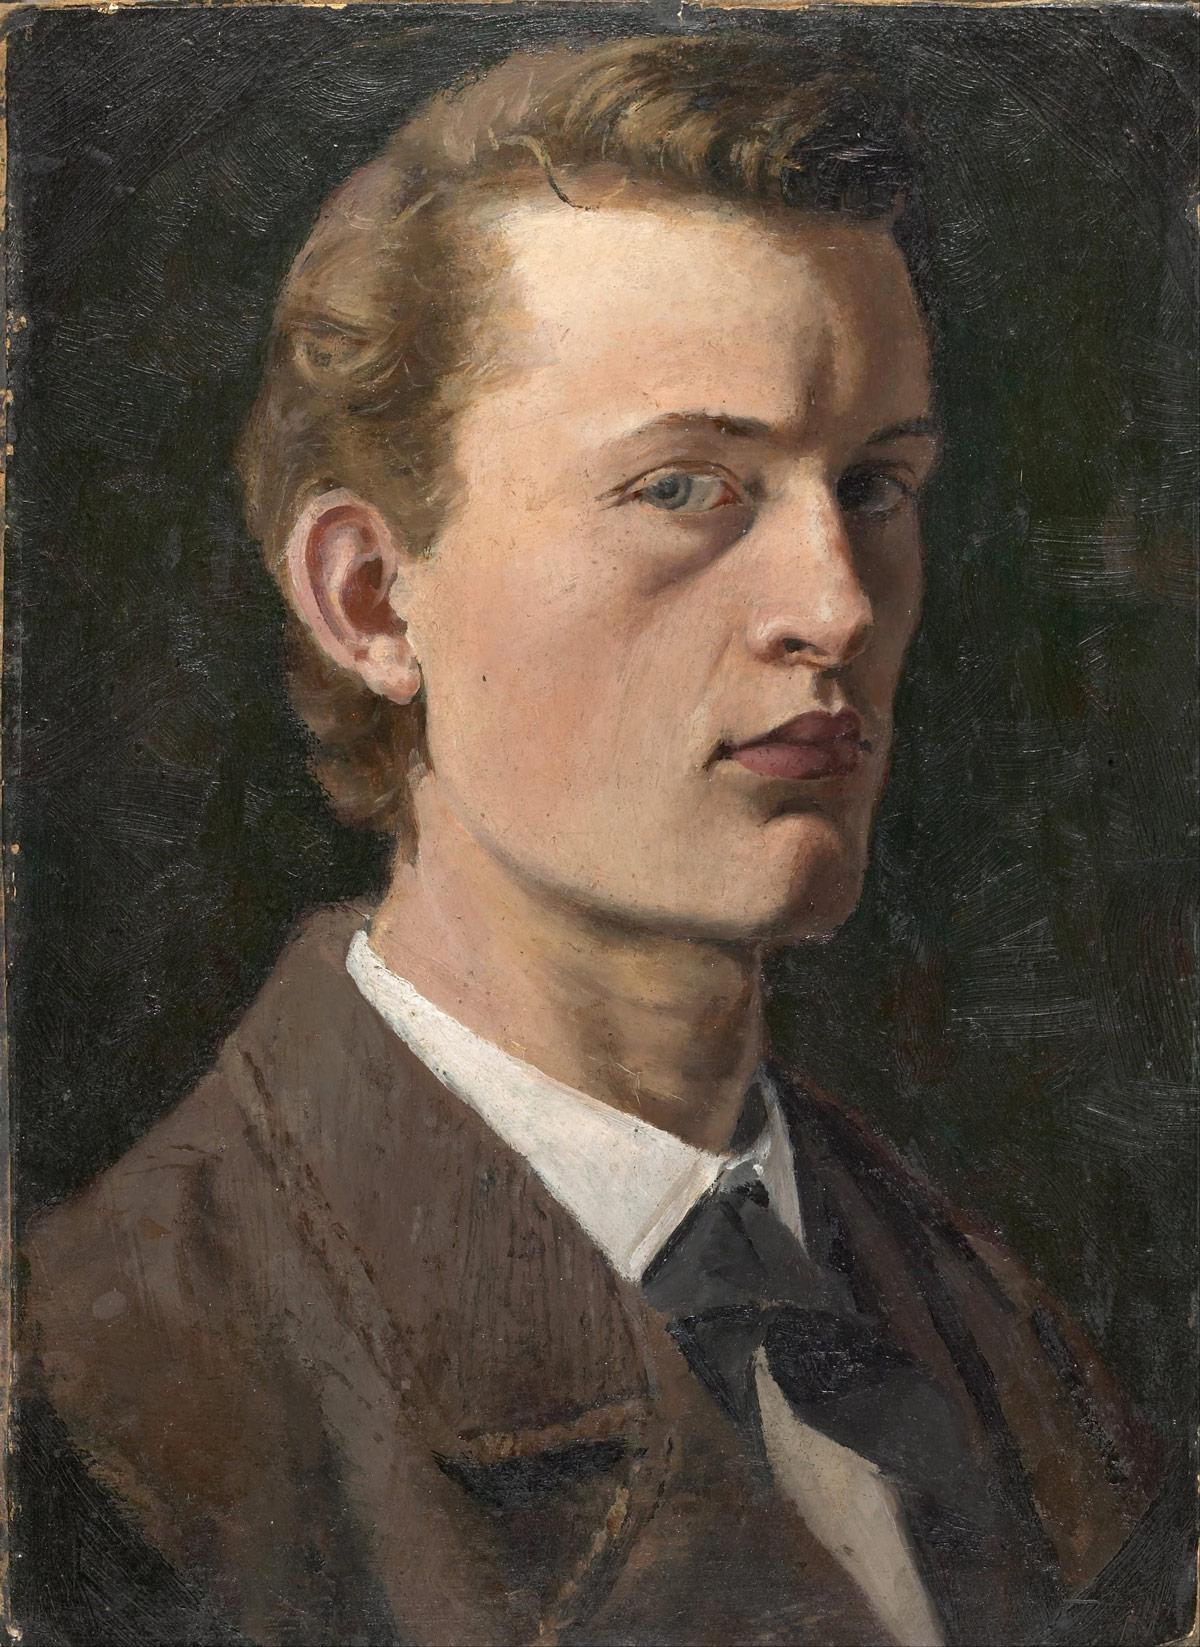 Edvard Munch. Selvportrett 1881 - 1882.